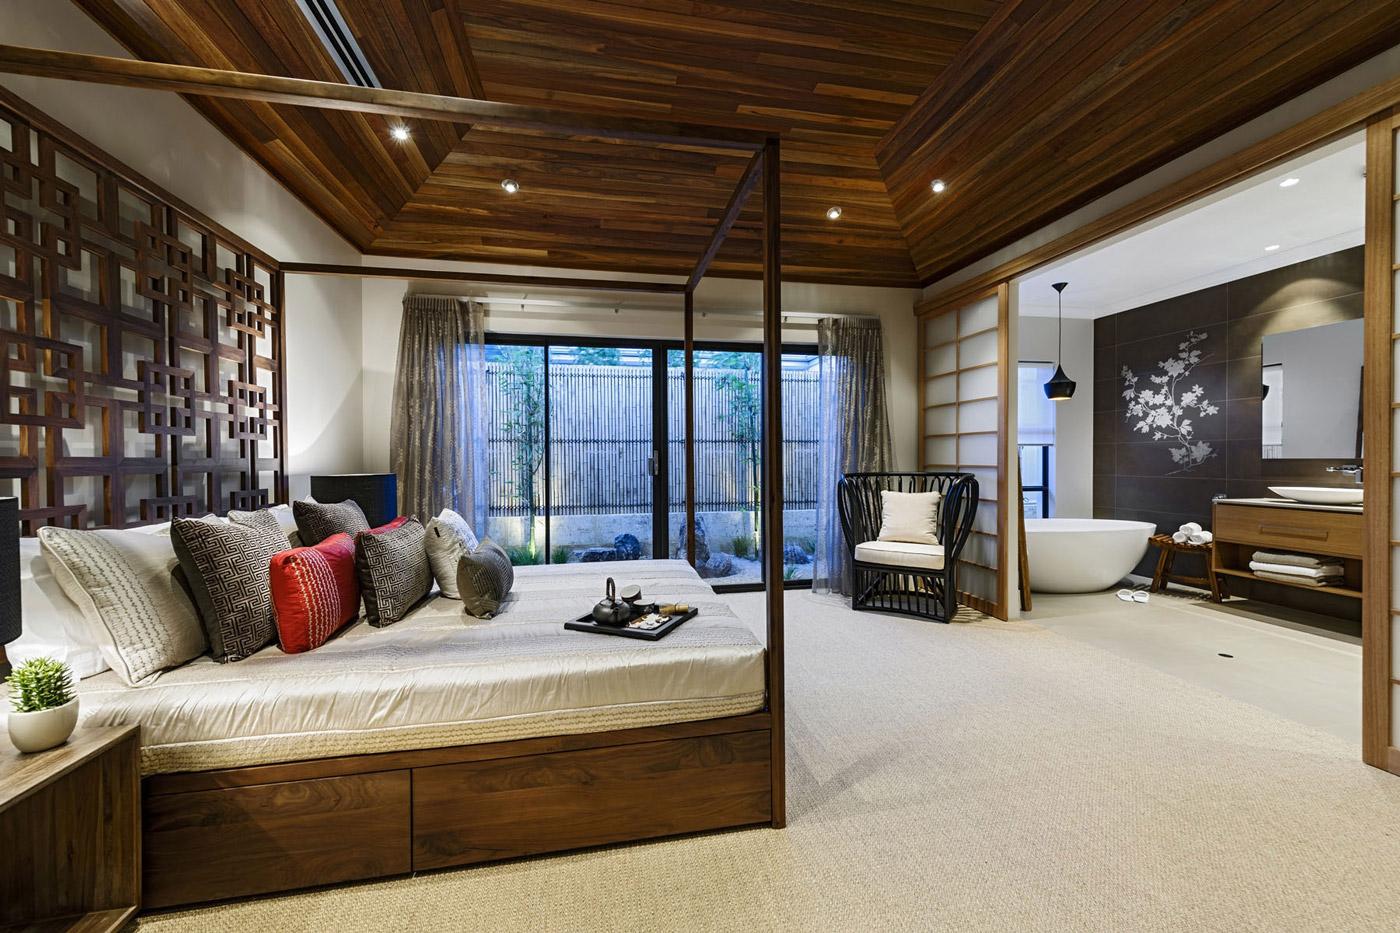 Bedroom, Bathroom, House in Burns Beach, Perth